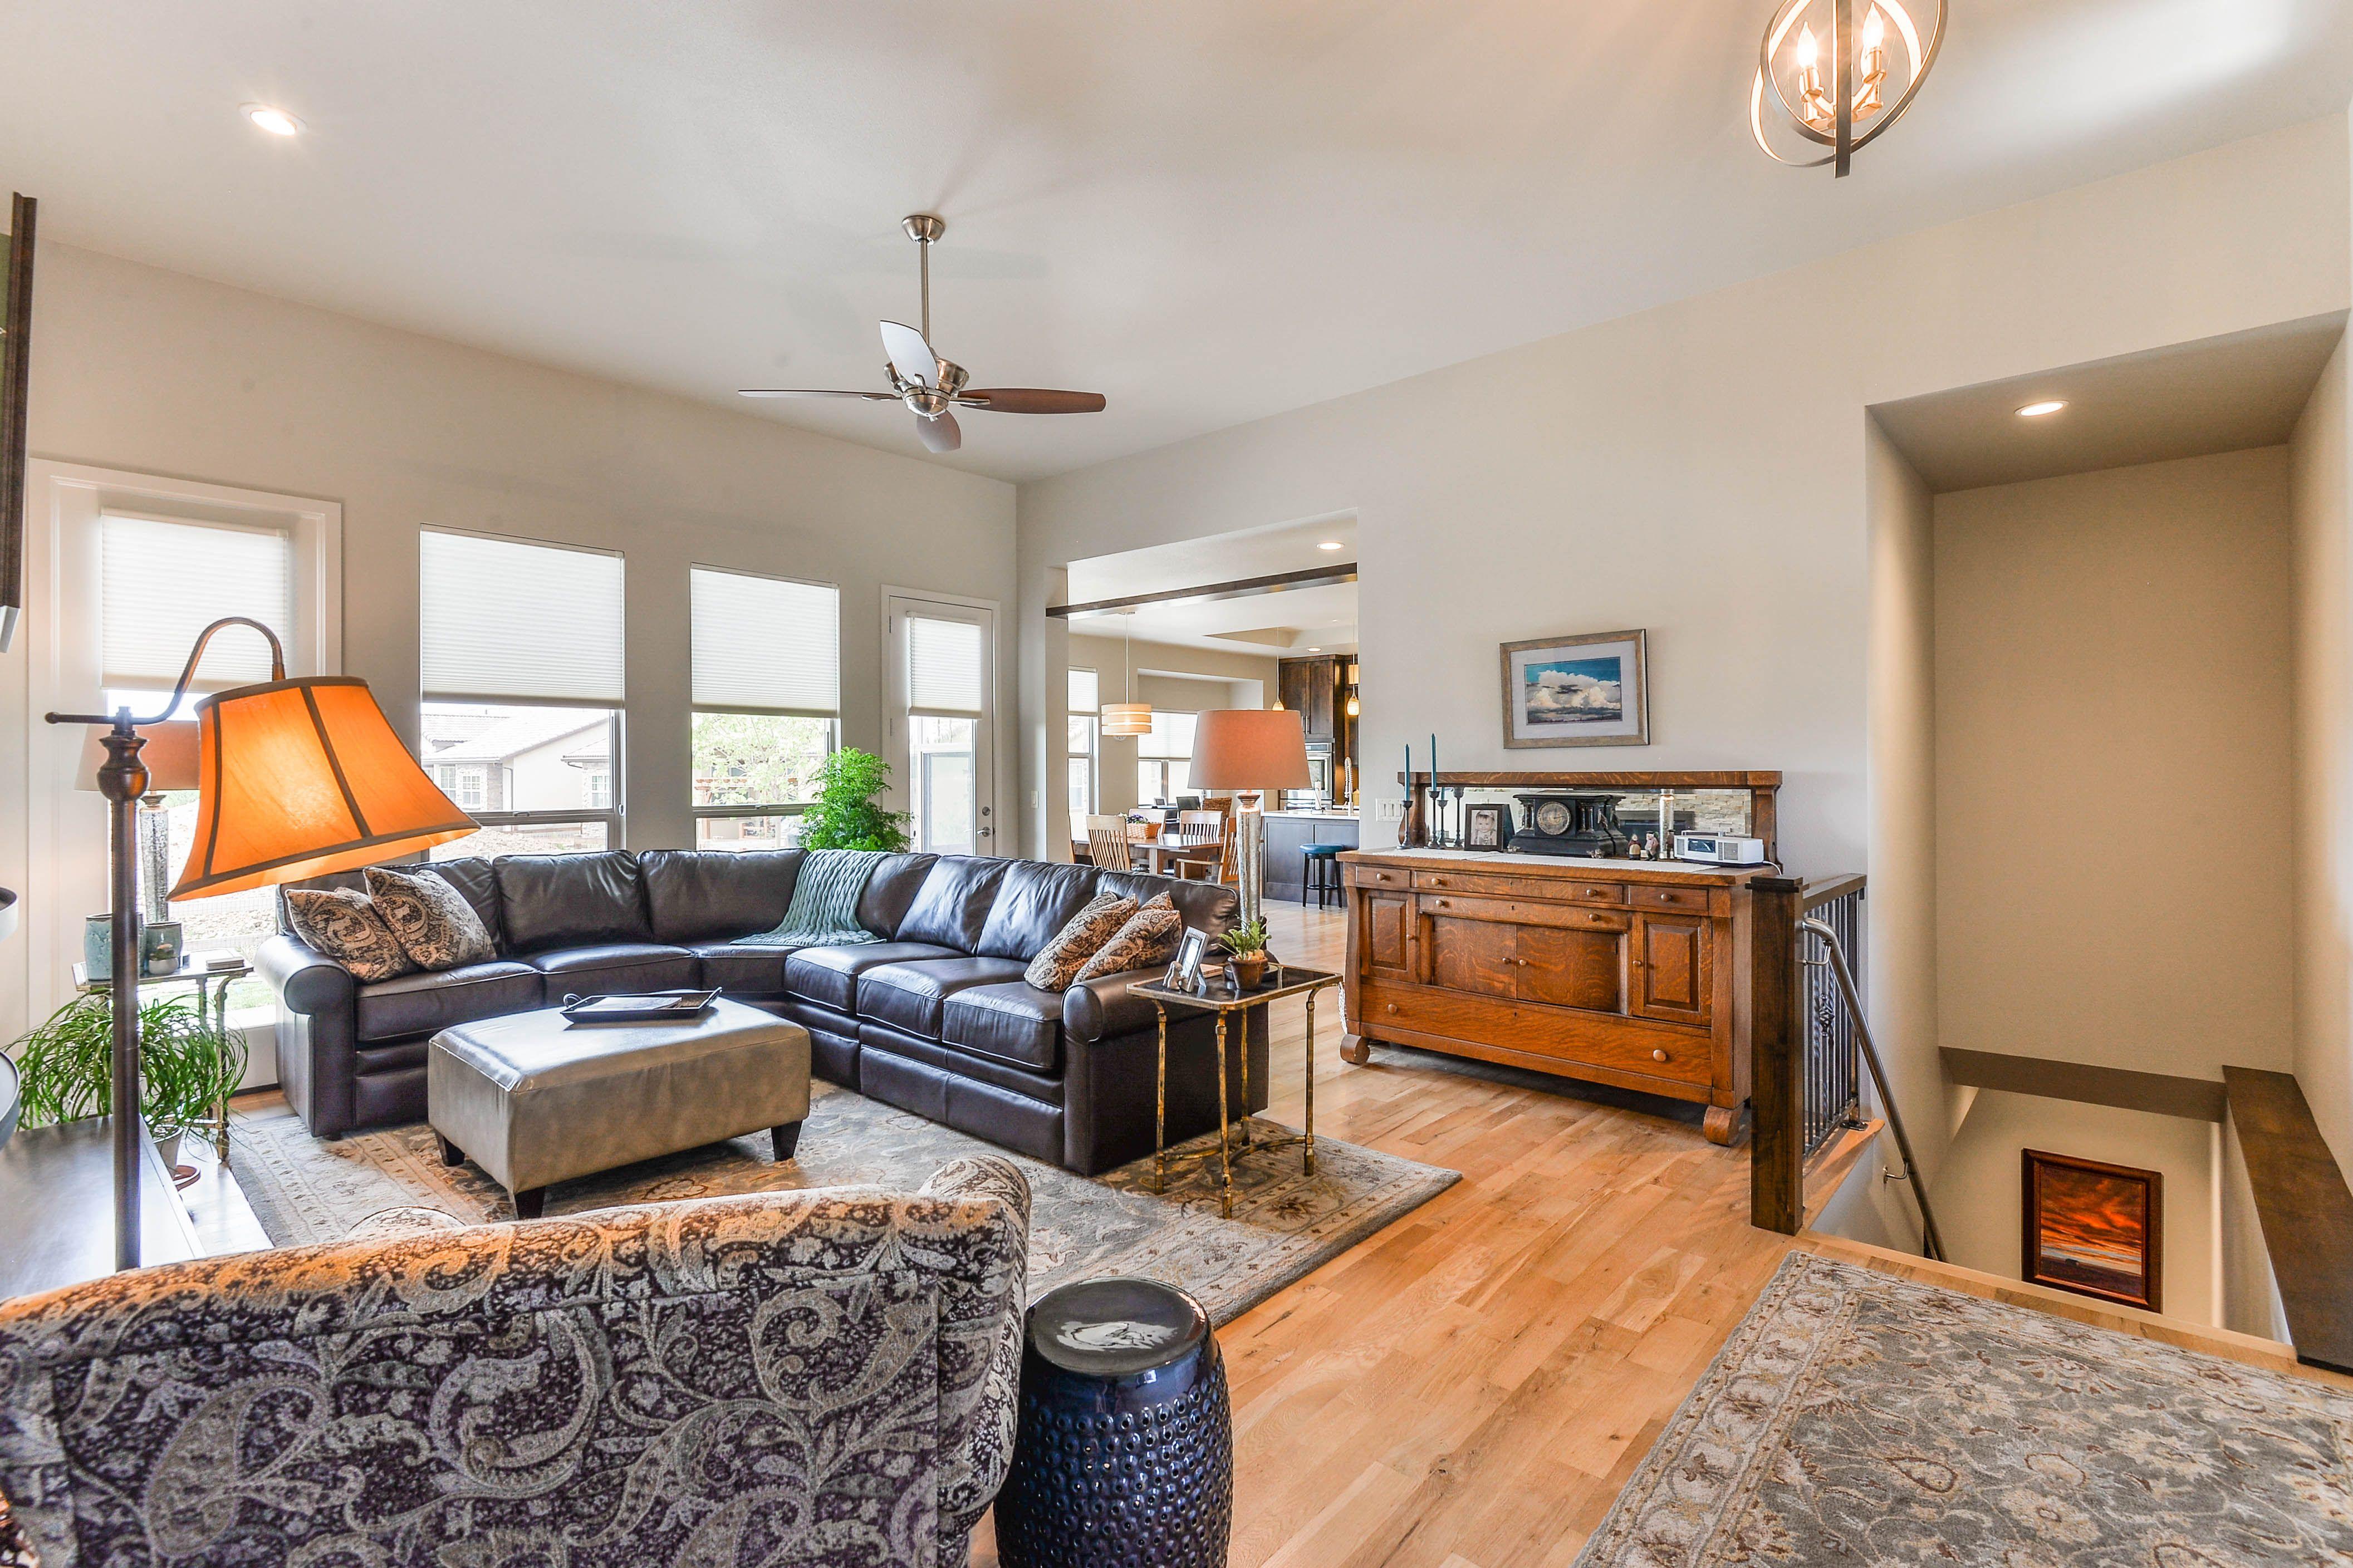 ... Stucco, Ranch House, Southeast Fort Collins, Living Room, Fort Collins,  Patio Home, Contemporary Furniture, Colorado, Interior Design, Dream Home,  ...